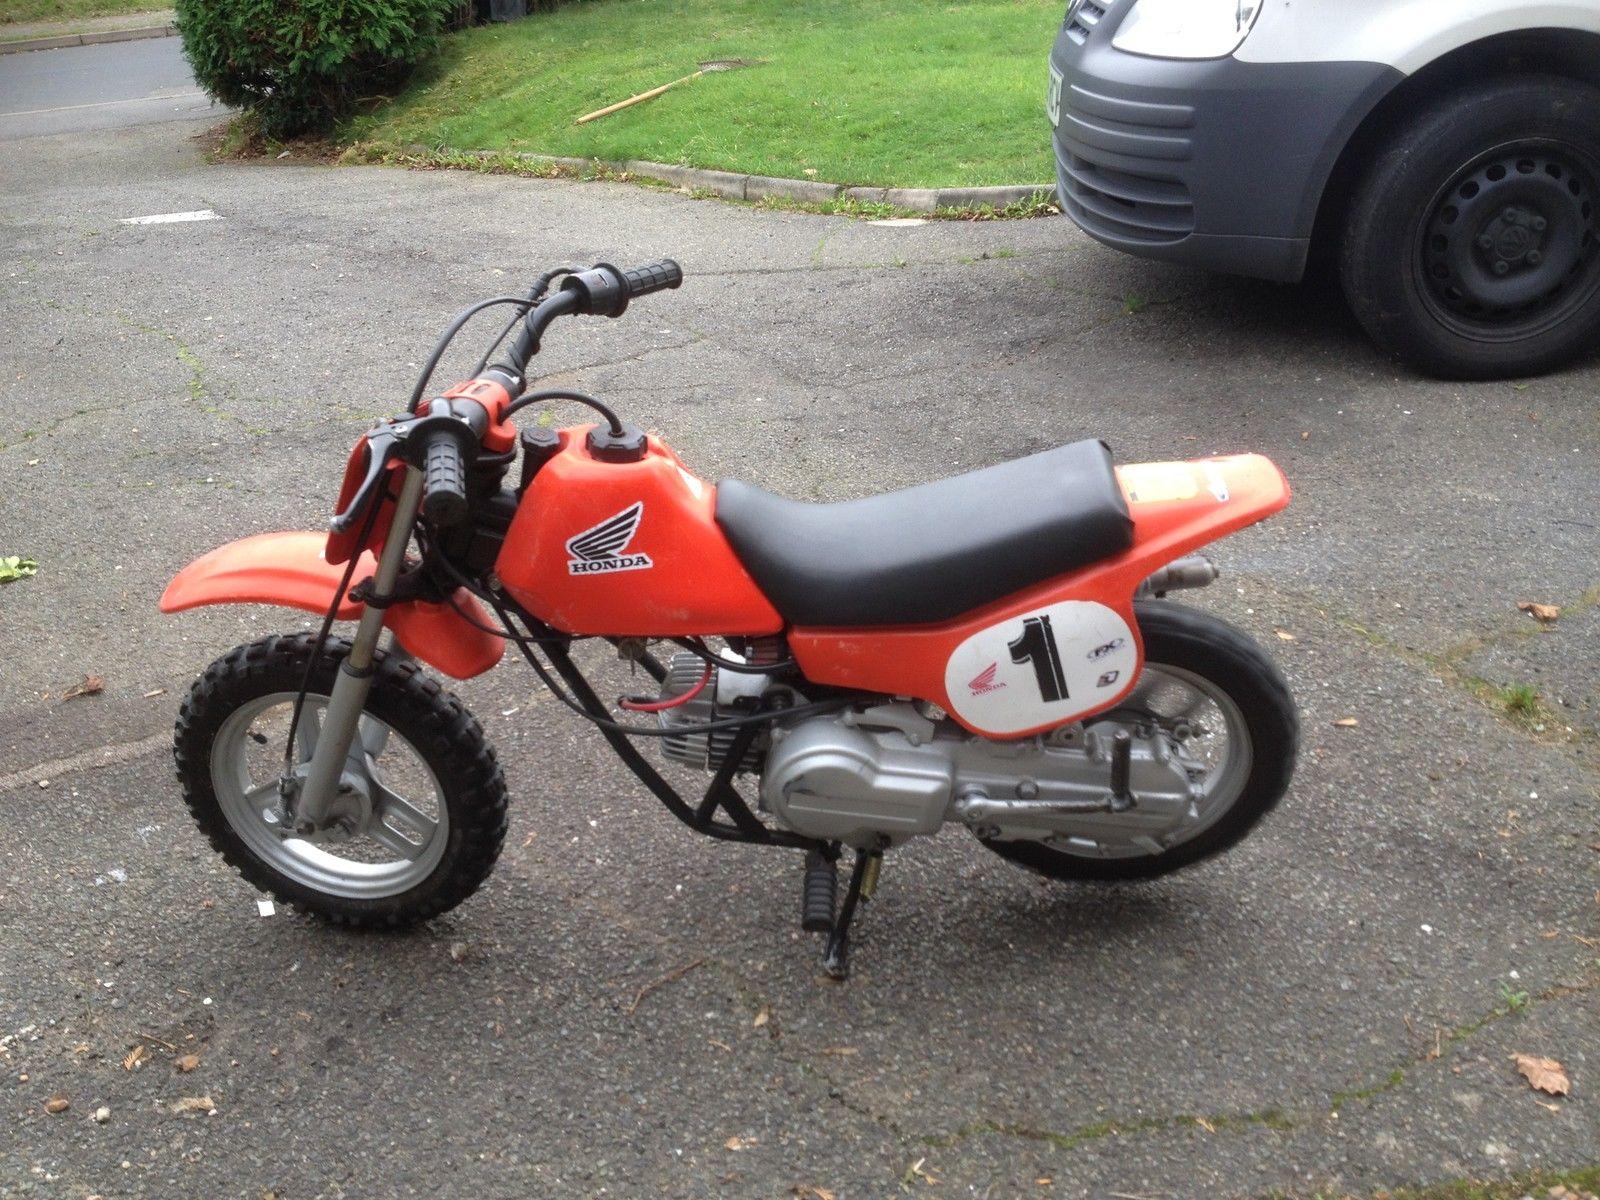 honda qr50 automatic kids1980s motocross off road bike not. Black Bedroom Furniture Sets. Home Design Ideas